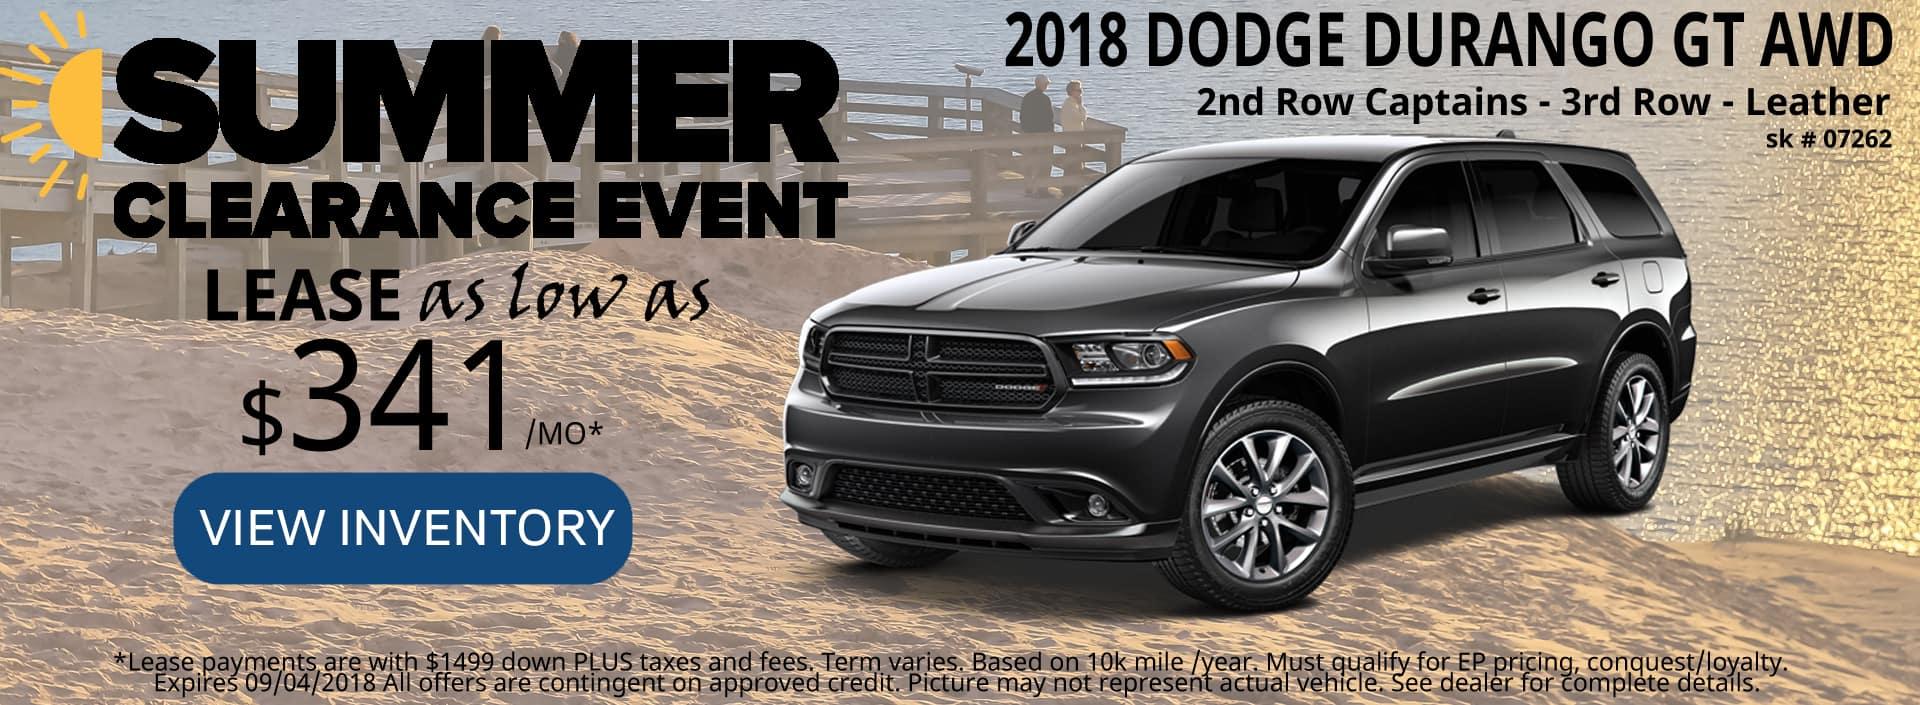 August 2018 Special Dodge Durango GT